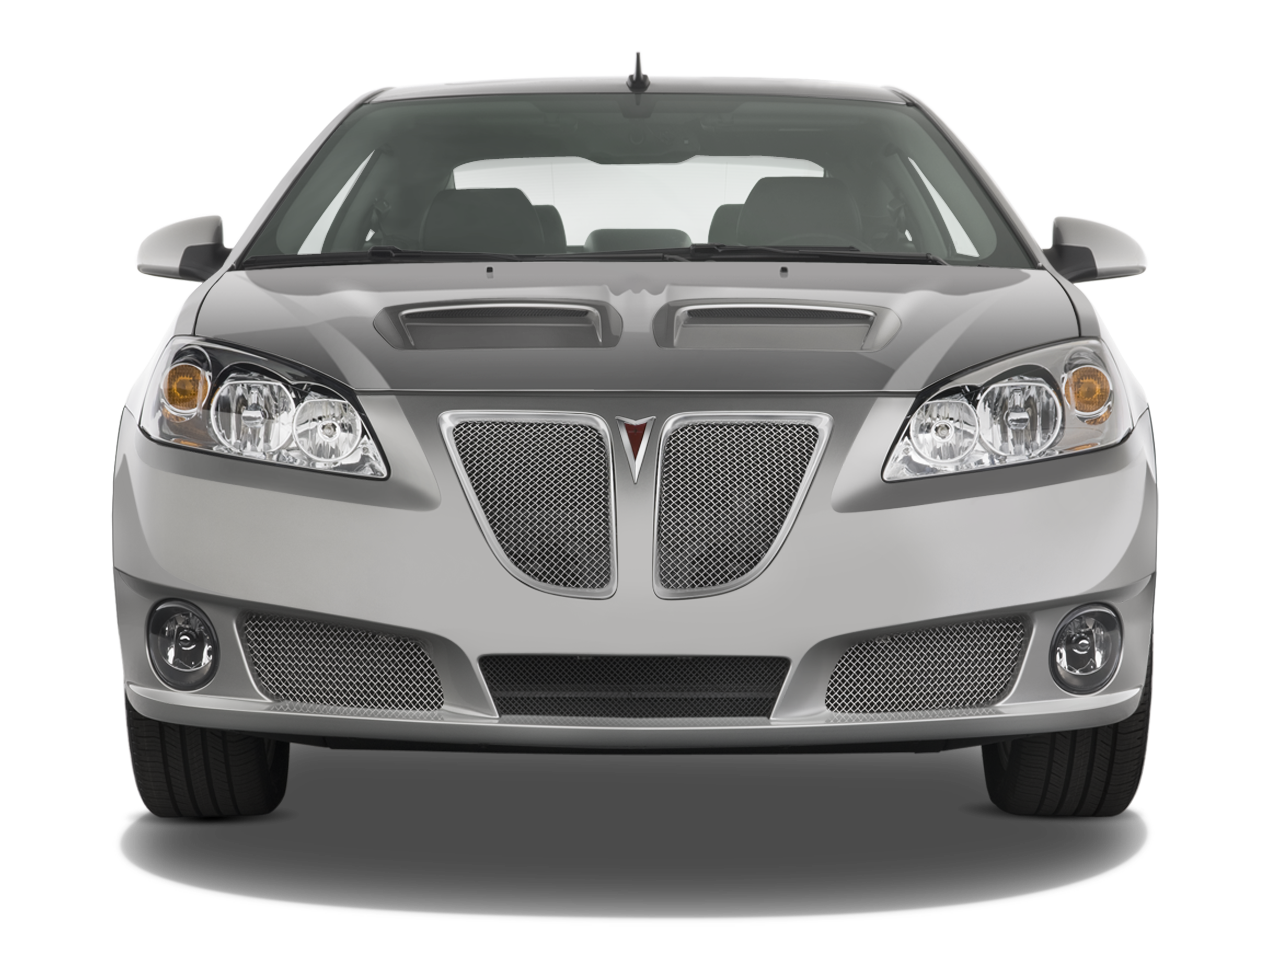 2008 Pontiac G6 Gxp 2008 Amp 2009 New Cars Automobile